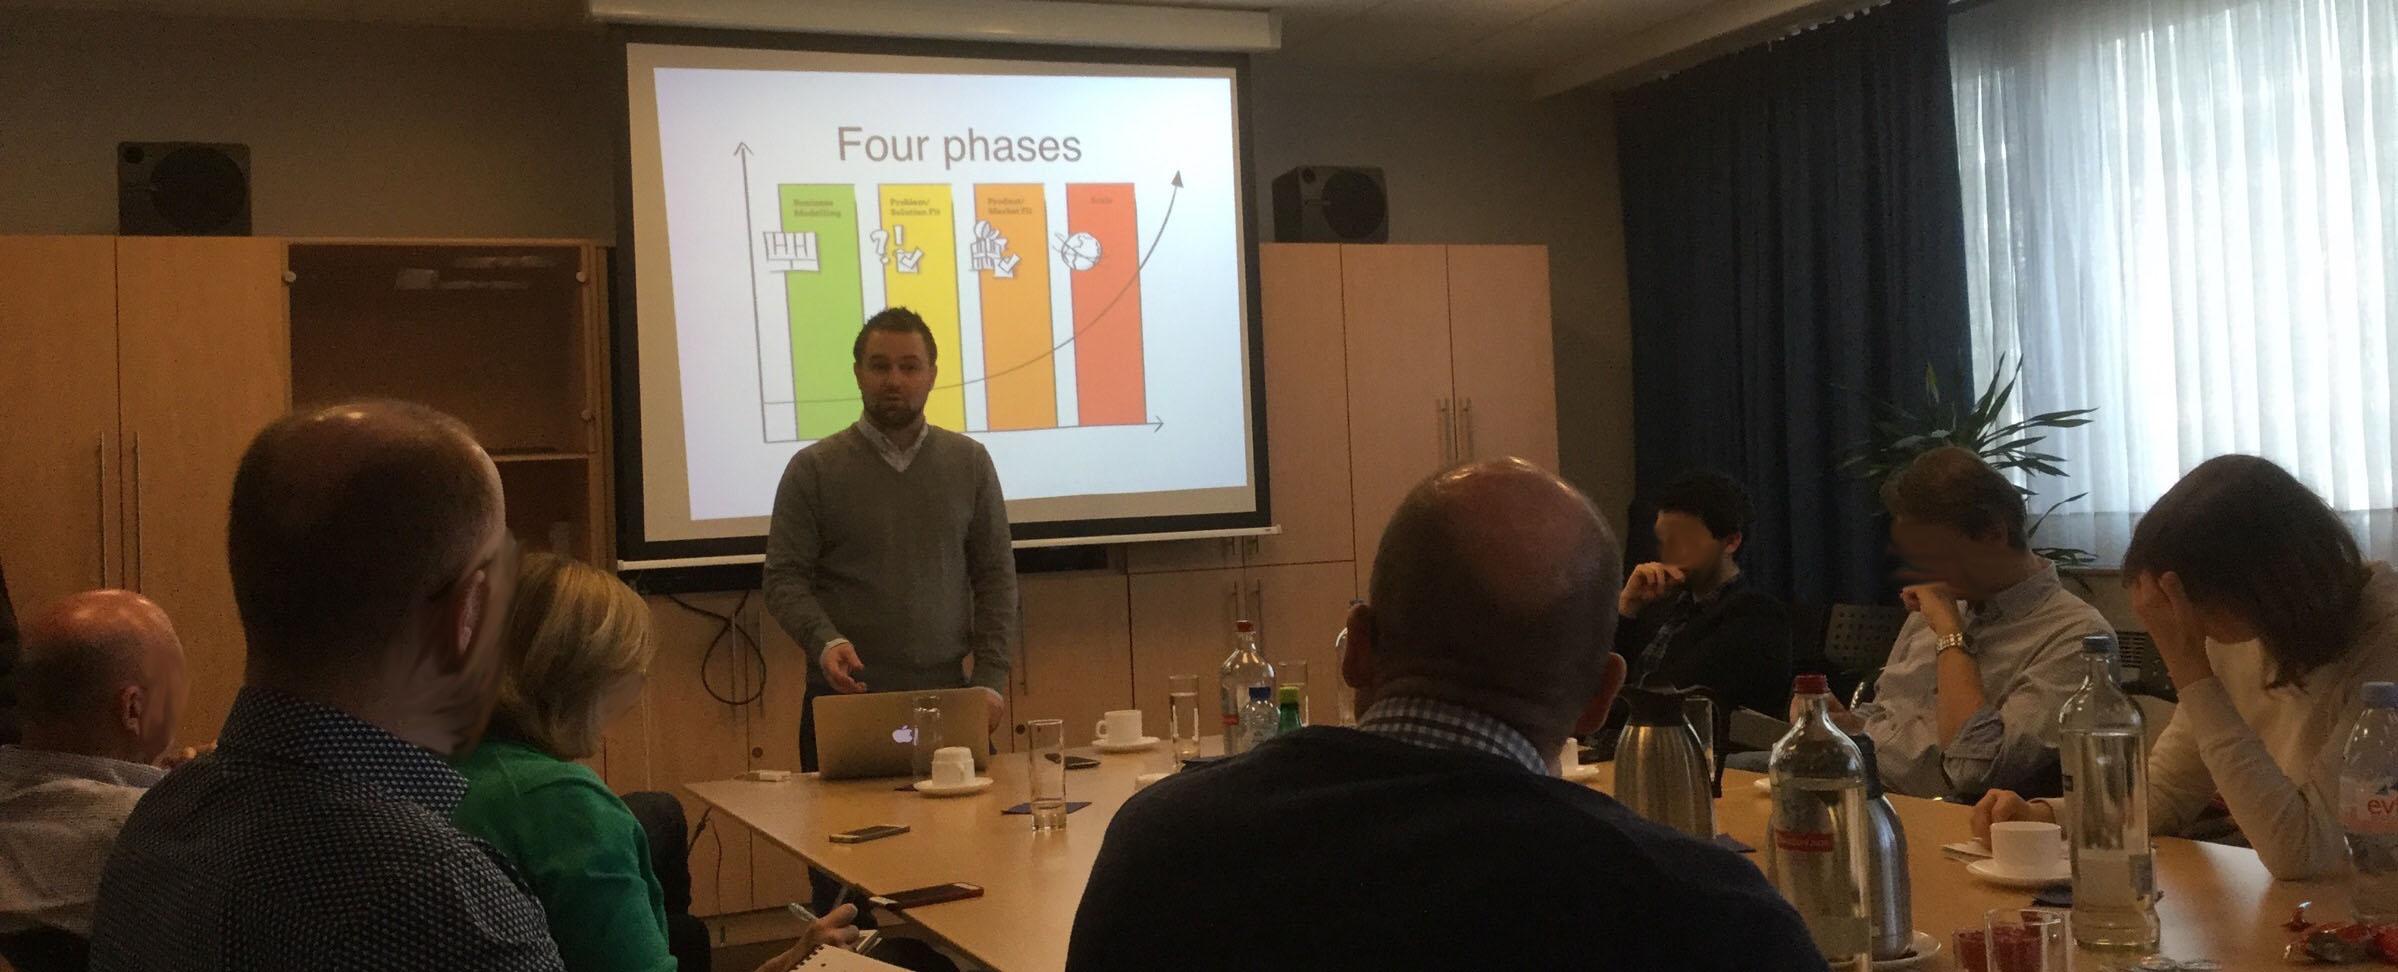 Playing Lean workshop - Lean Startup 101